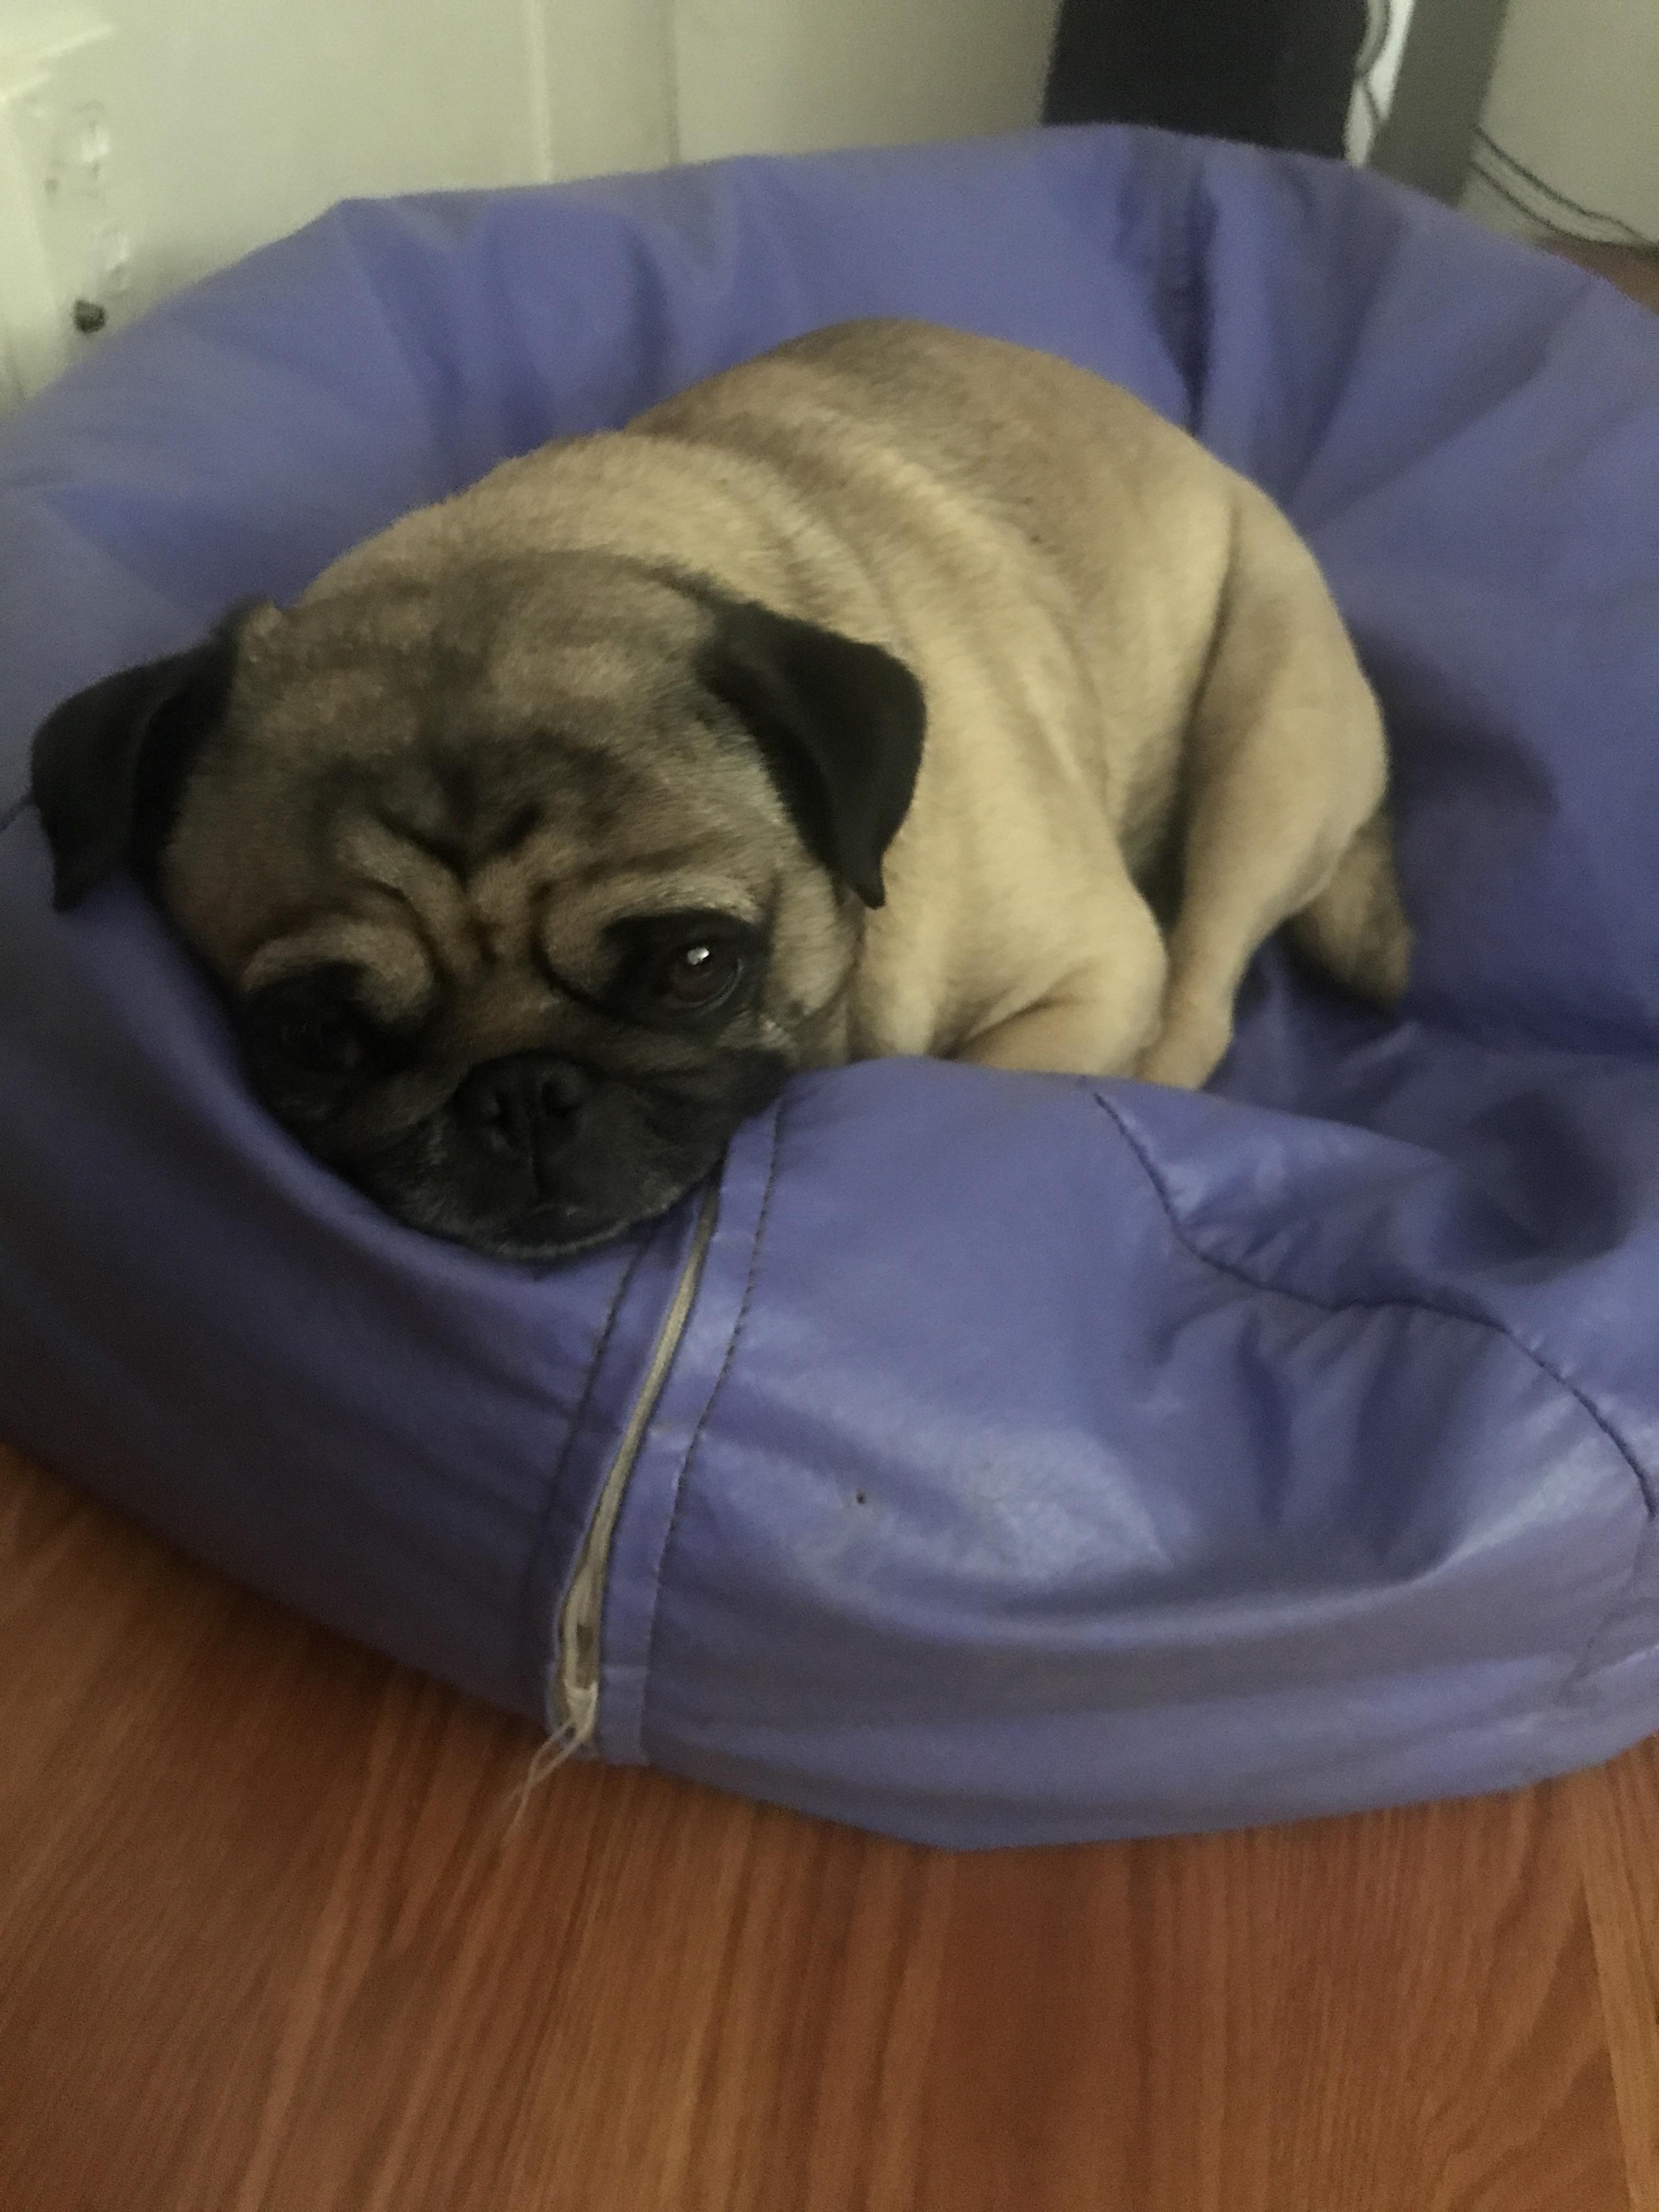 Pleasant He Love His Beanbag And Sleeping On It Pug Pugs Machost Co Dining Chair Design Ideas Machostcouk